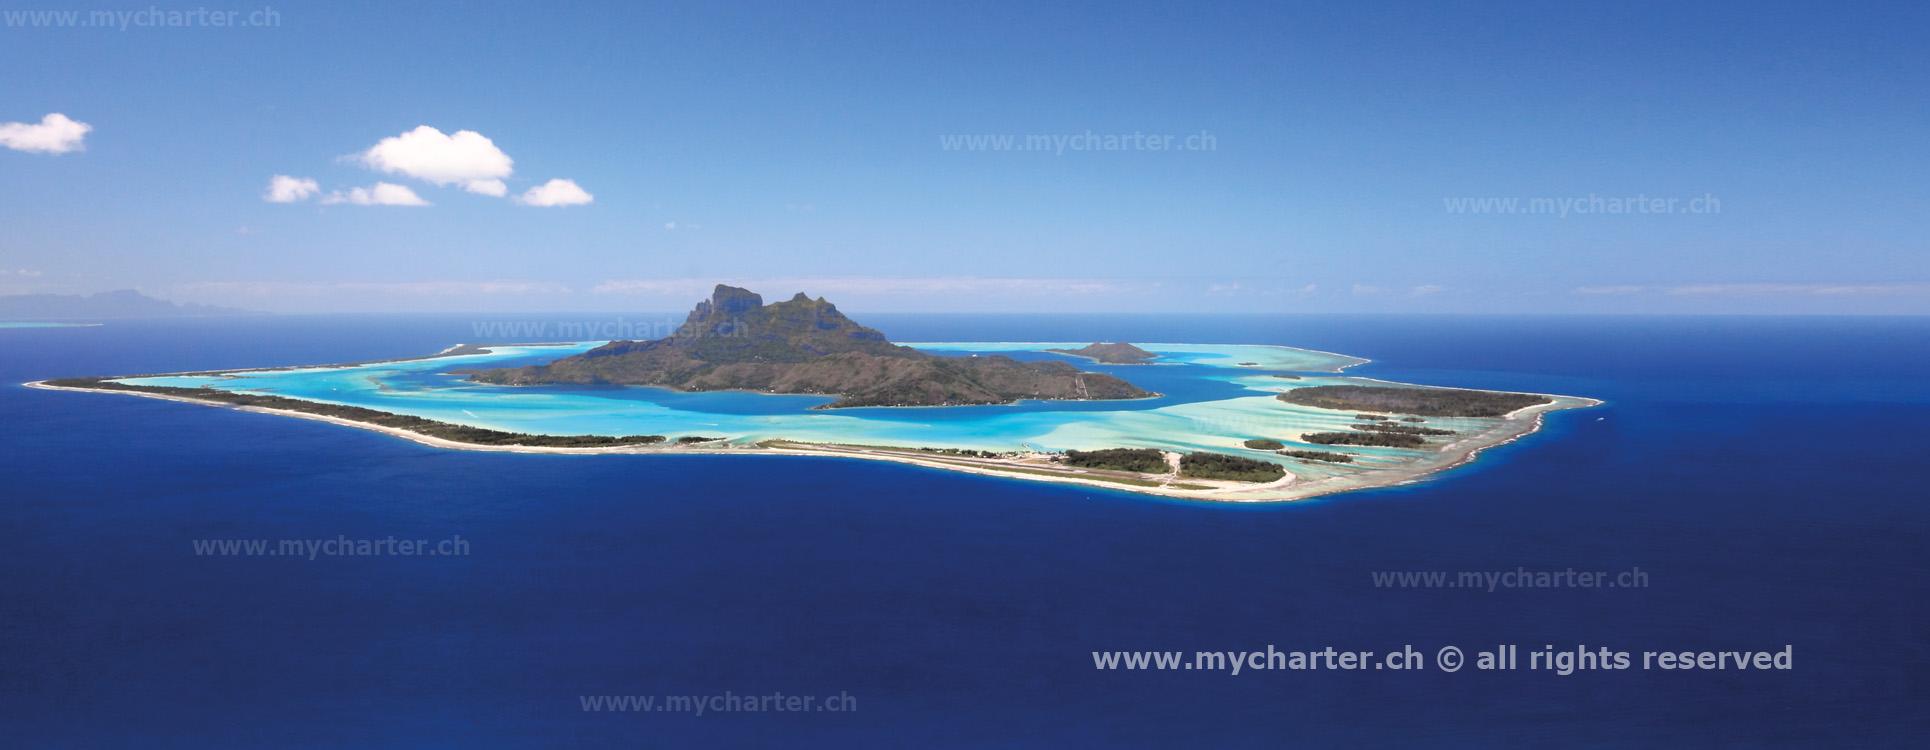 Sicht von Tahiti Insel Bora Bora